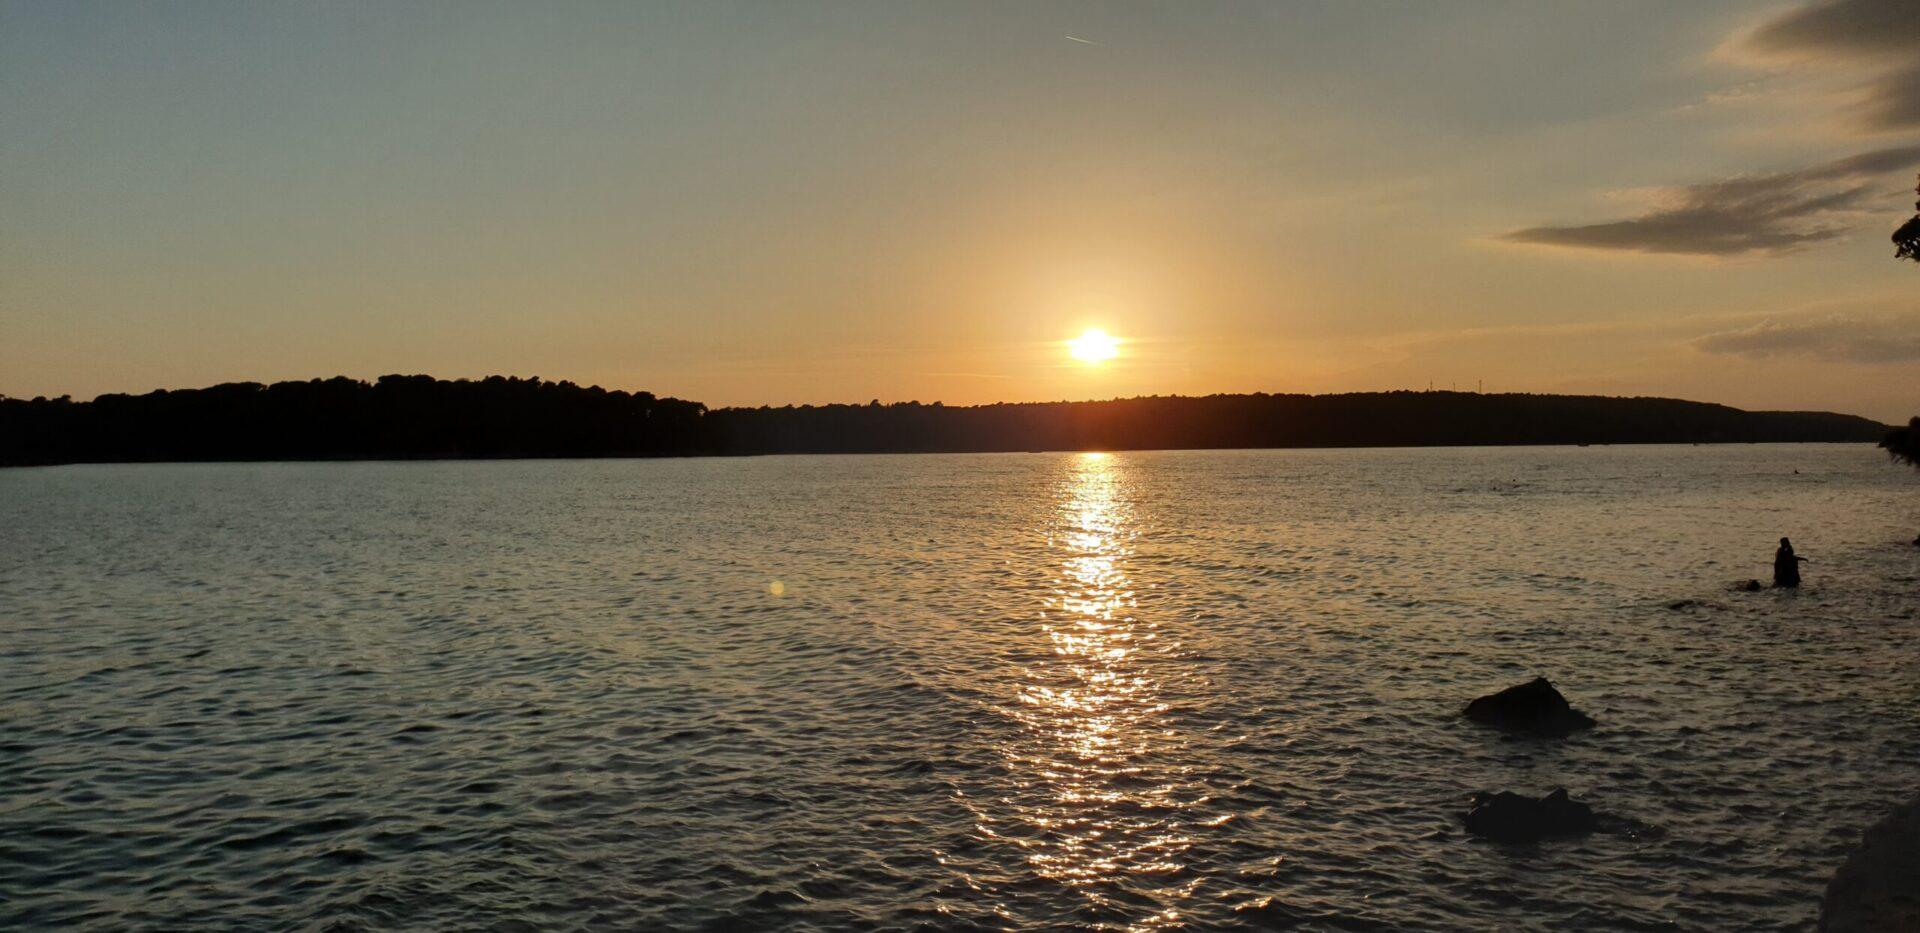 Rab - zalazak sunca